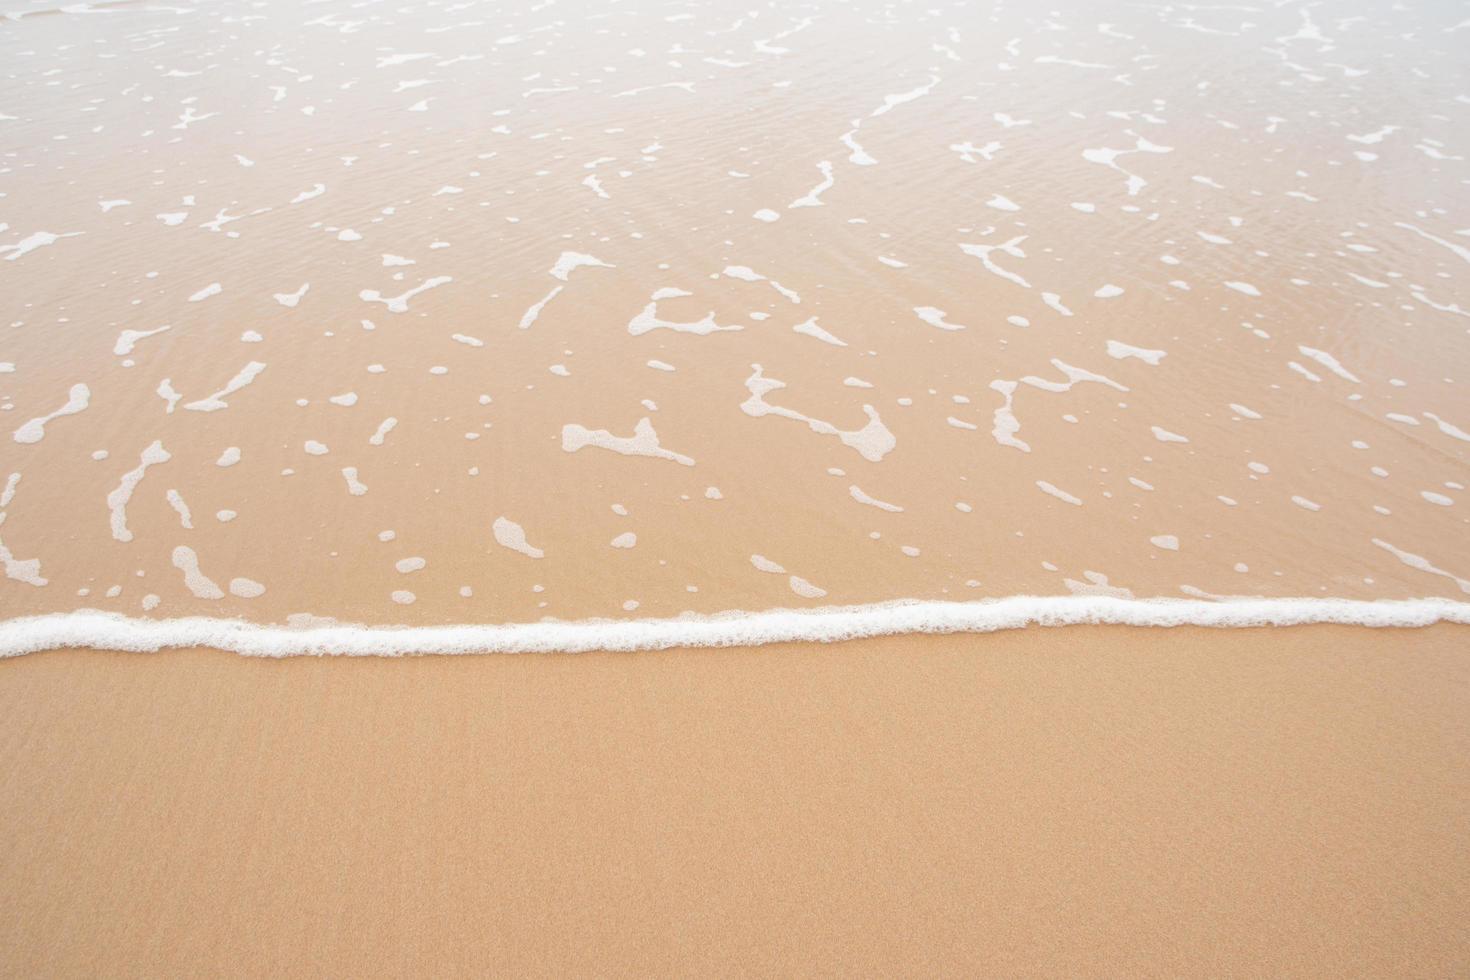 las olas se acercan a la playa foto